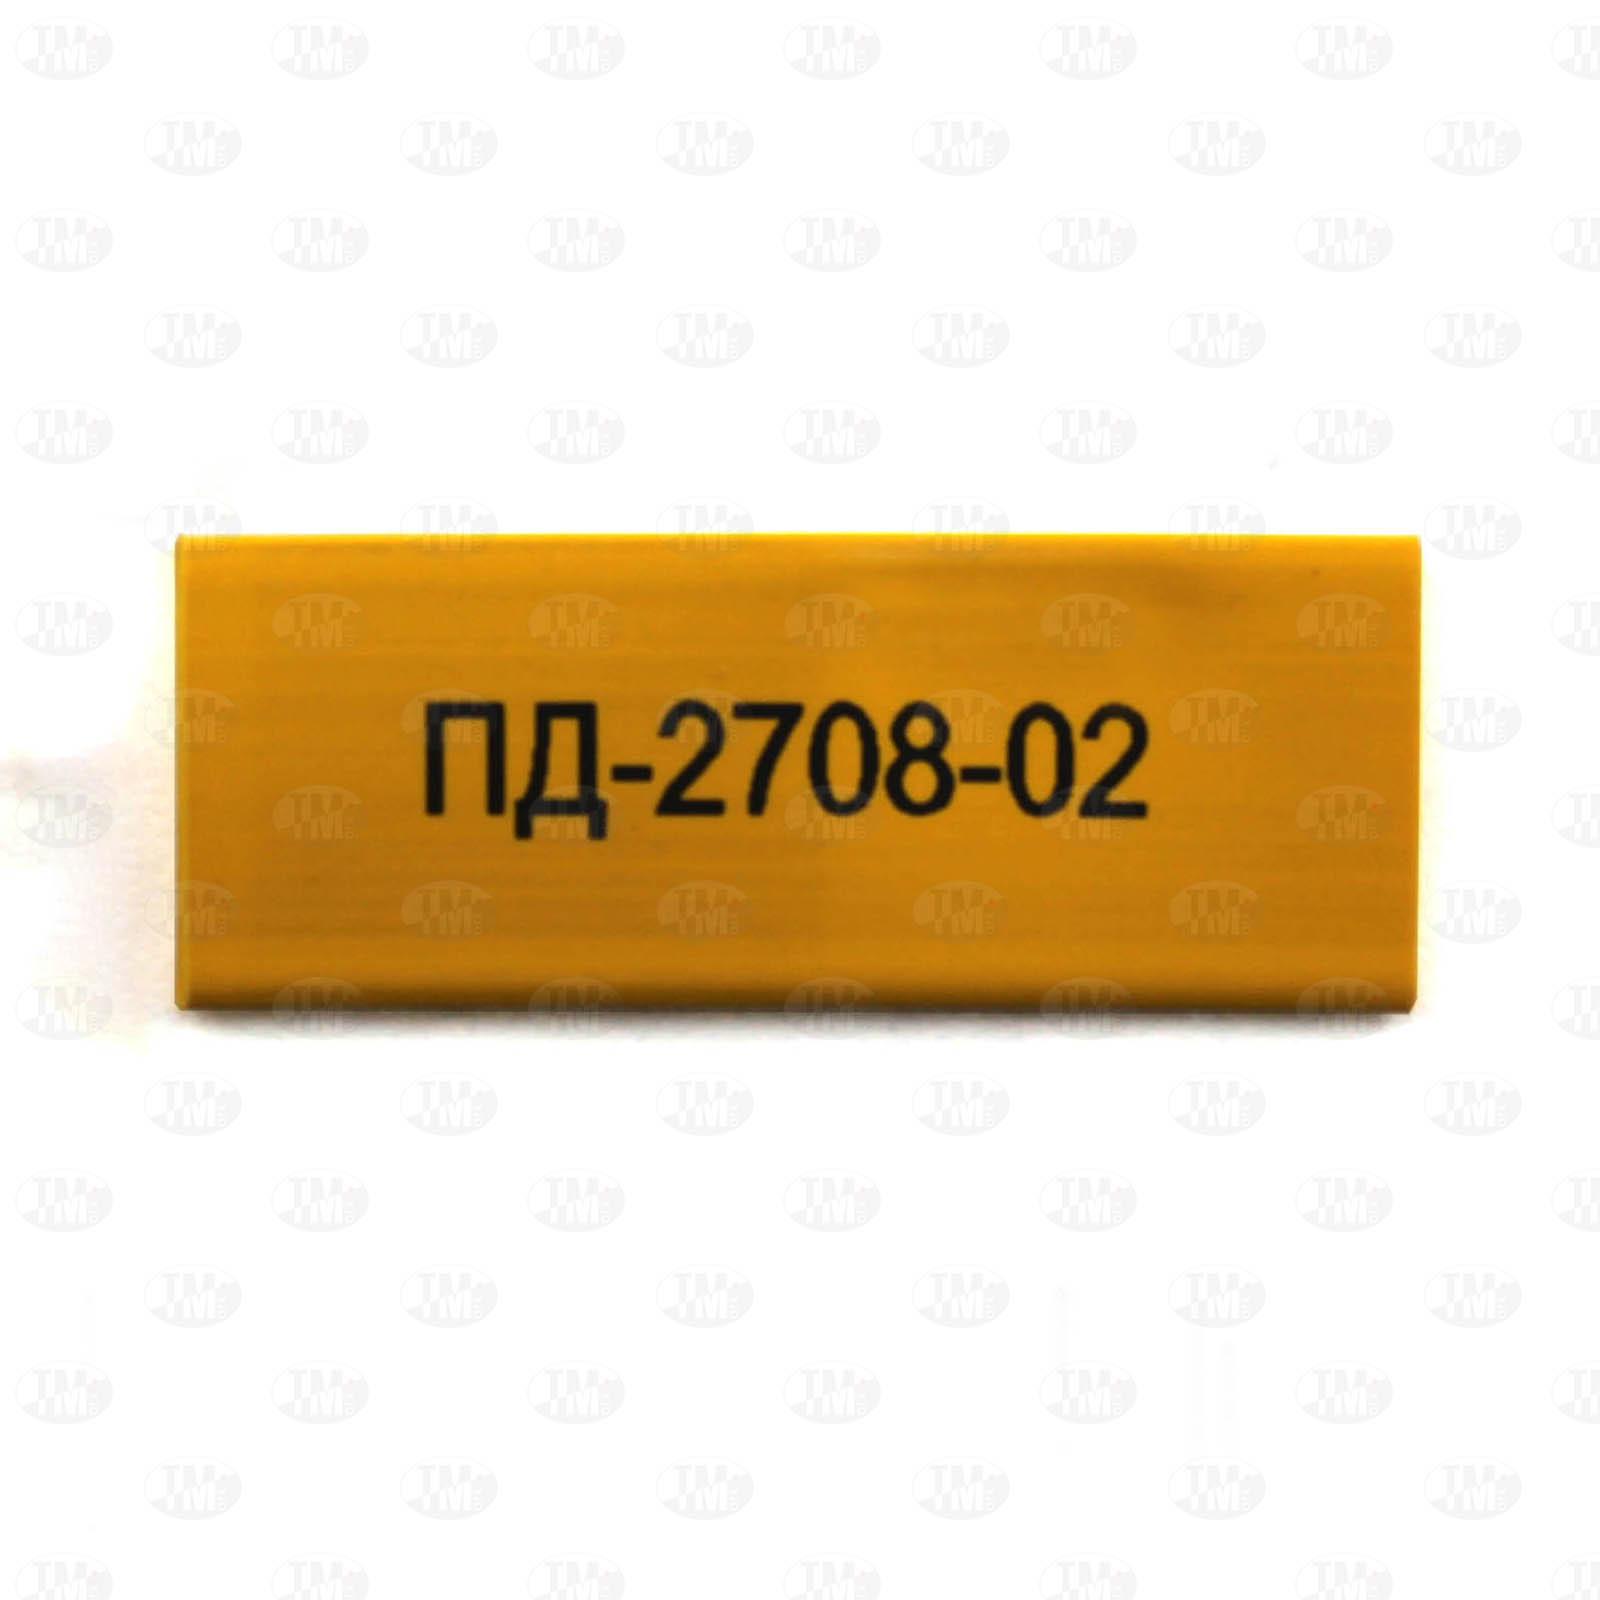 Термоусадочный маркер FTTM 9,5*4,8 мм